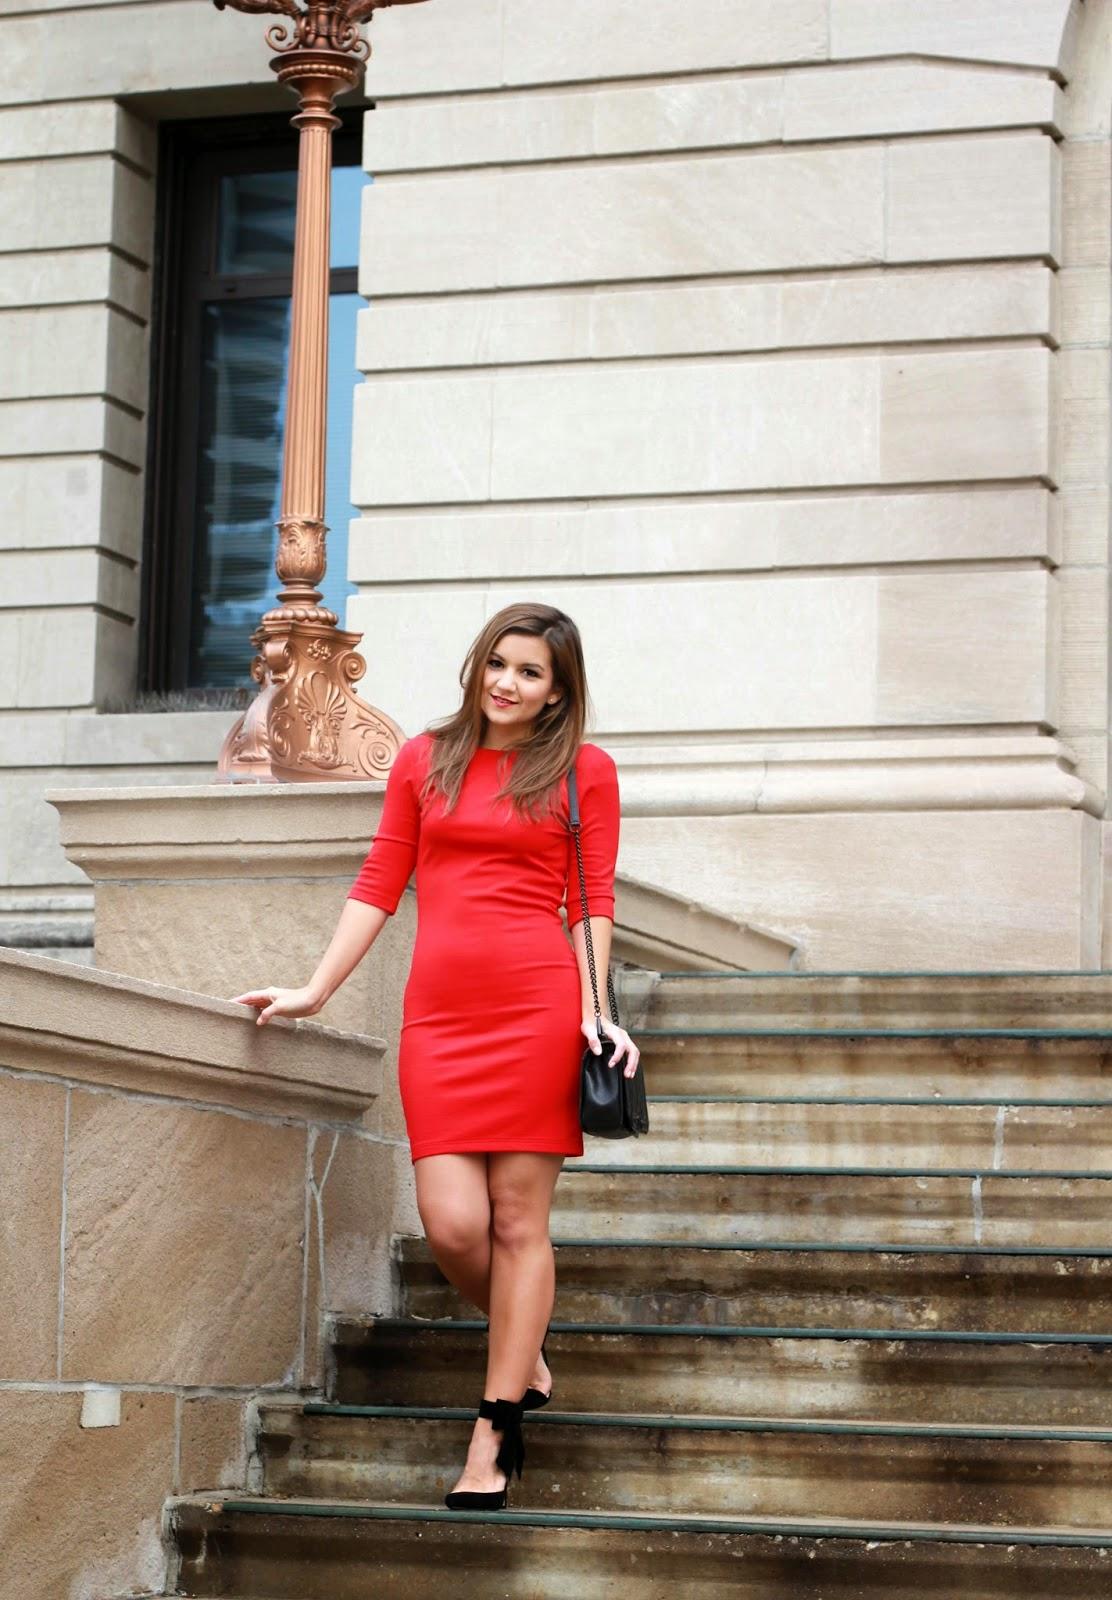 O got my red dress on tonight